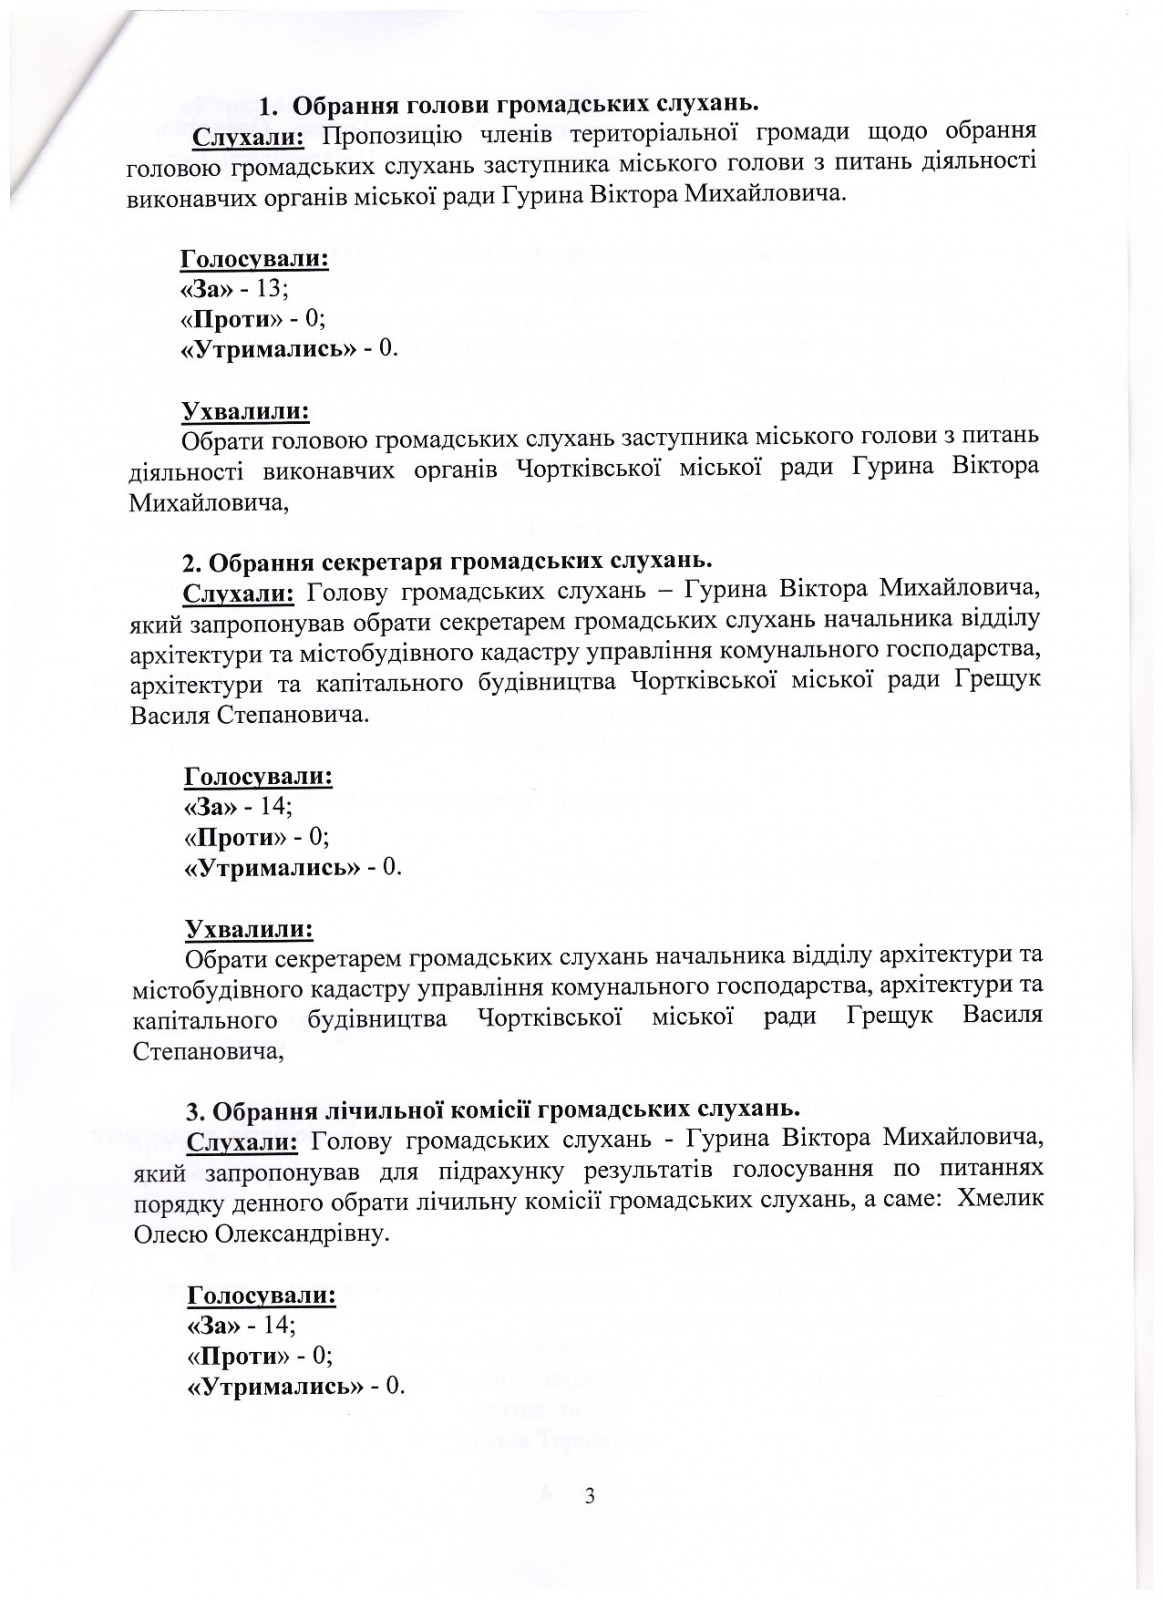 протокол громадських слухань_03-09-2021 (-3